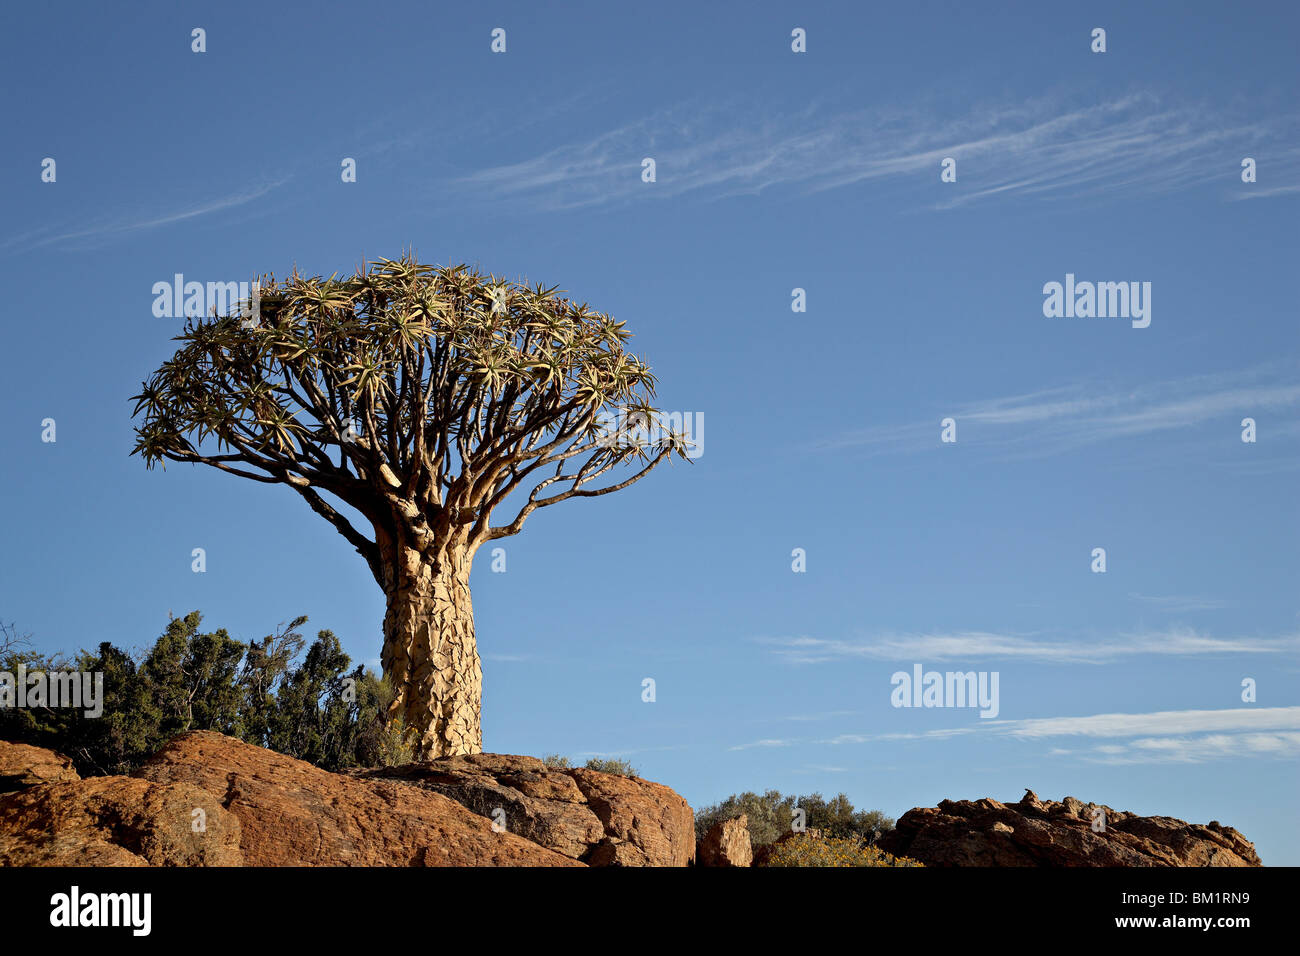 Arbre carquois (kokerboom (Aloe dichotoma)), springbok, Afrique du Sud, l'Afrique Photo Stock